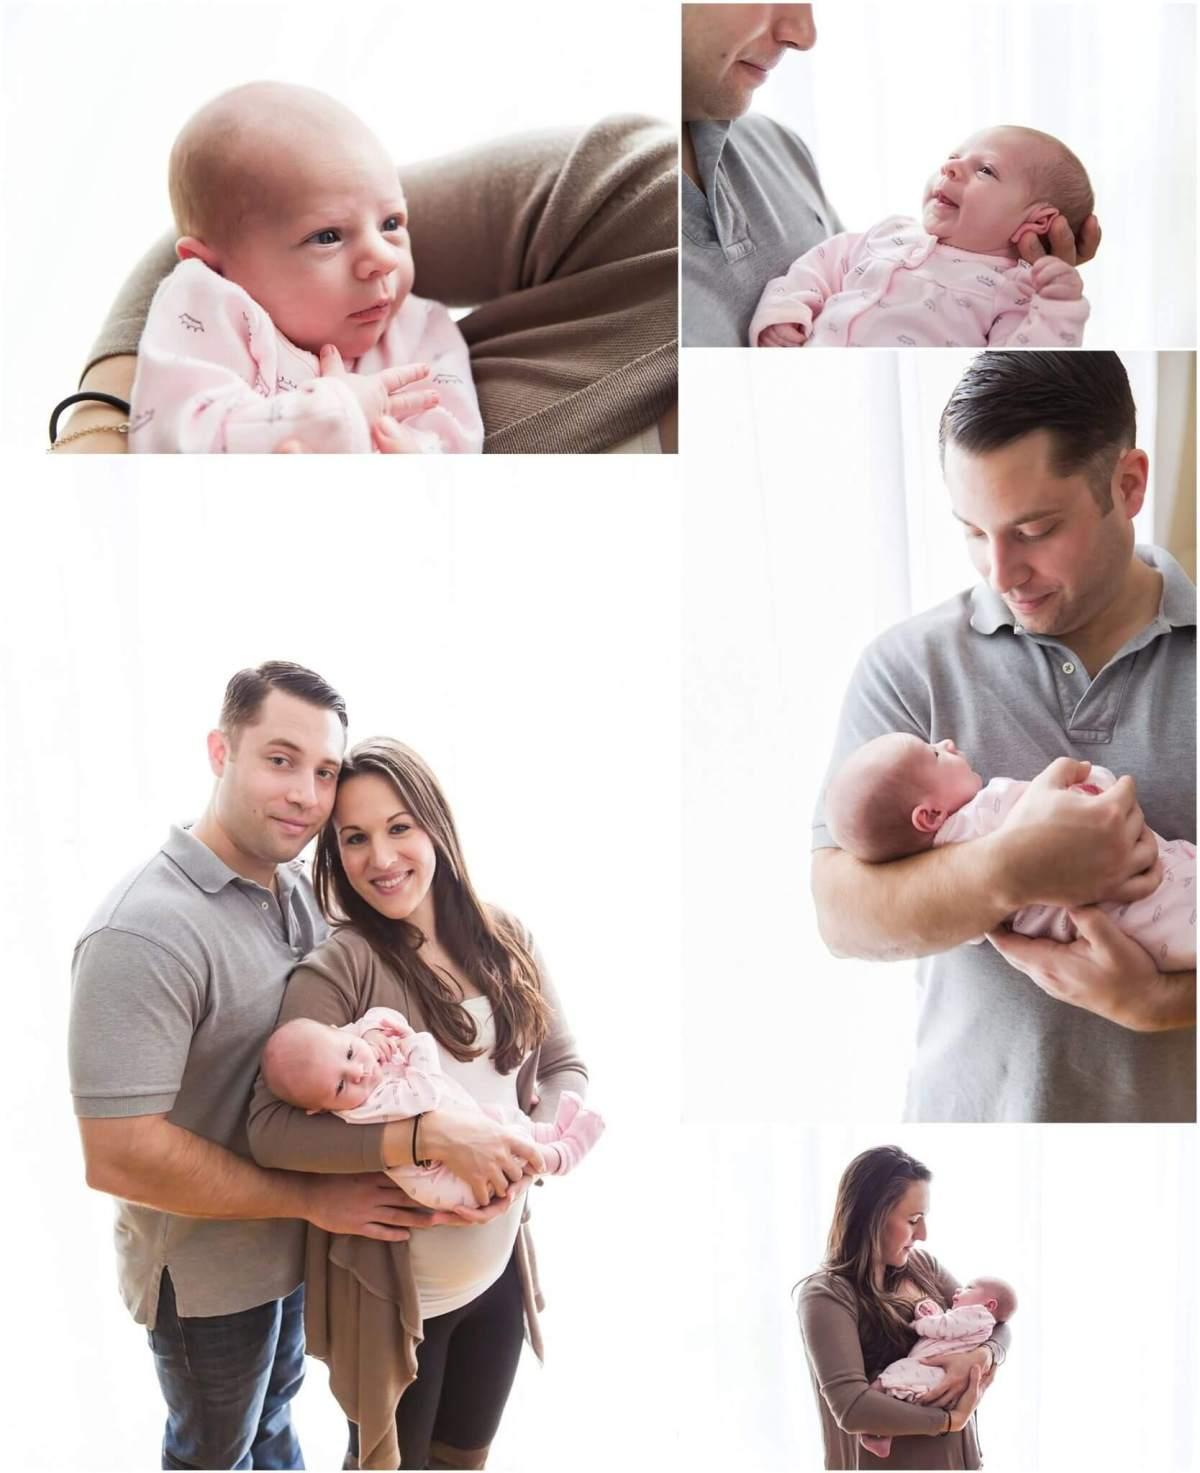 lifestyle newborn session. family holding newborn baby girl using large window as softbox backlighting them.